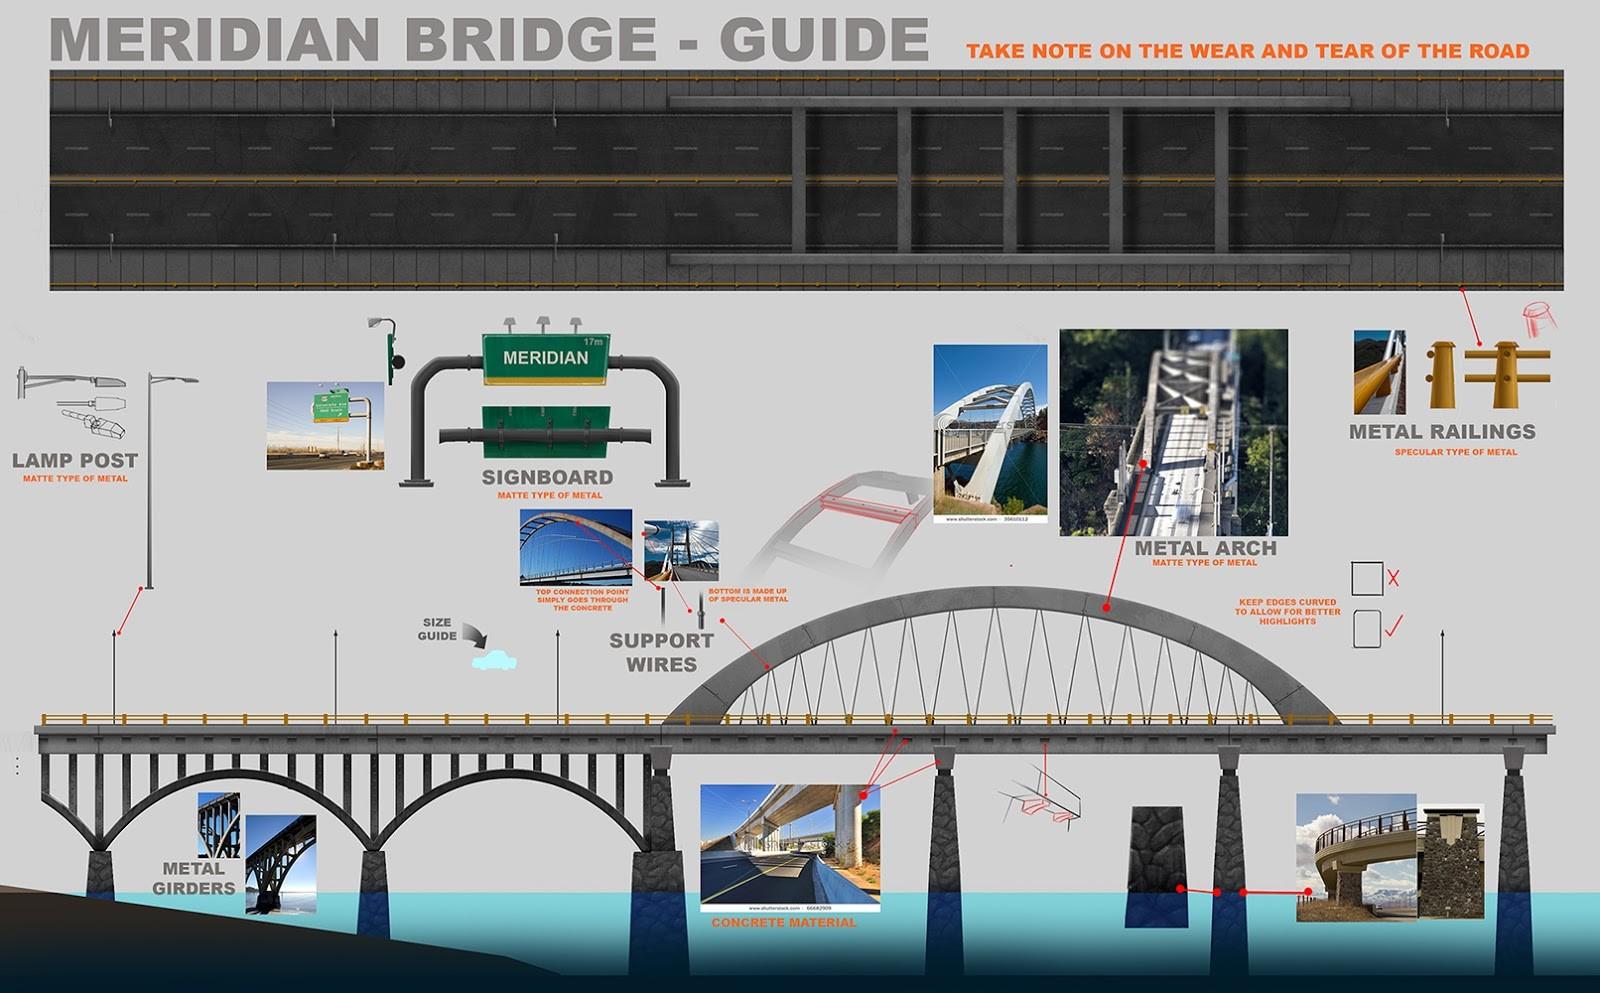 Jose cua bridge guide